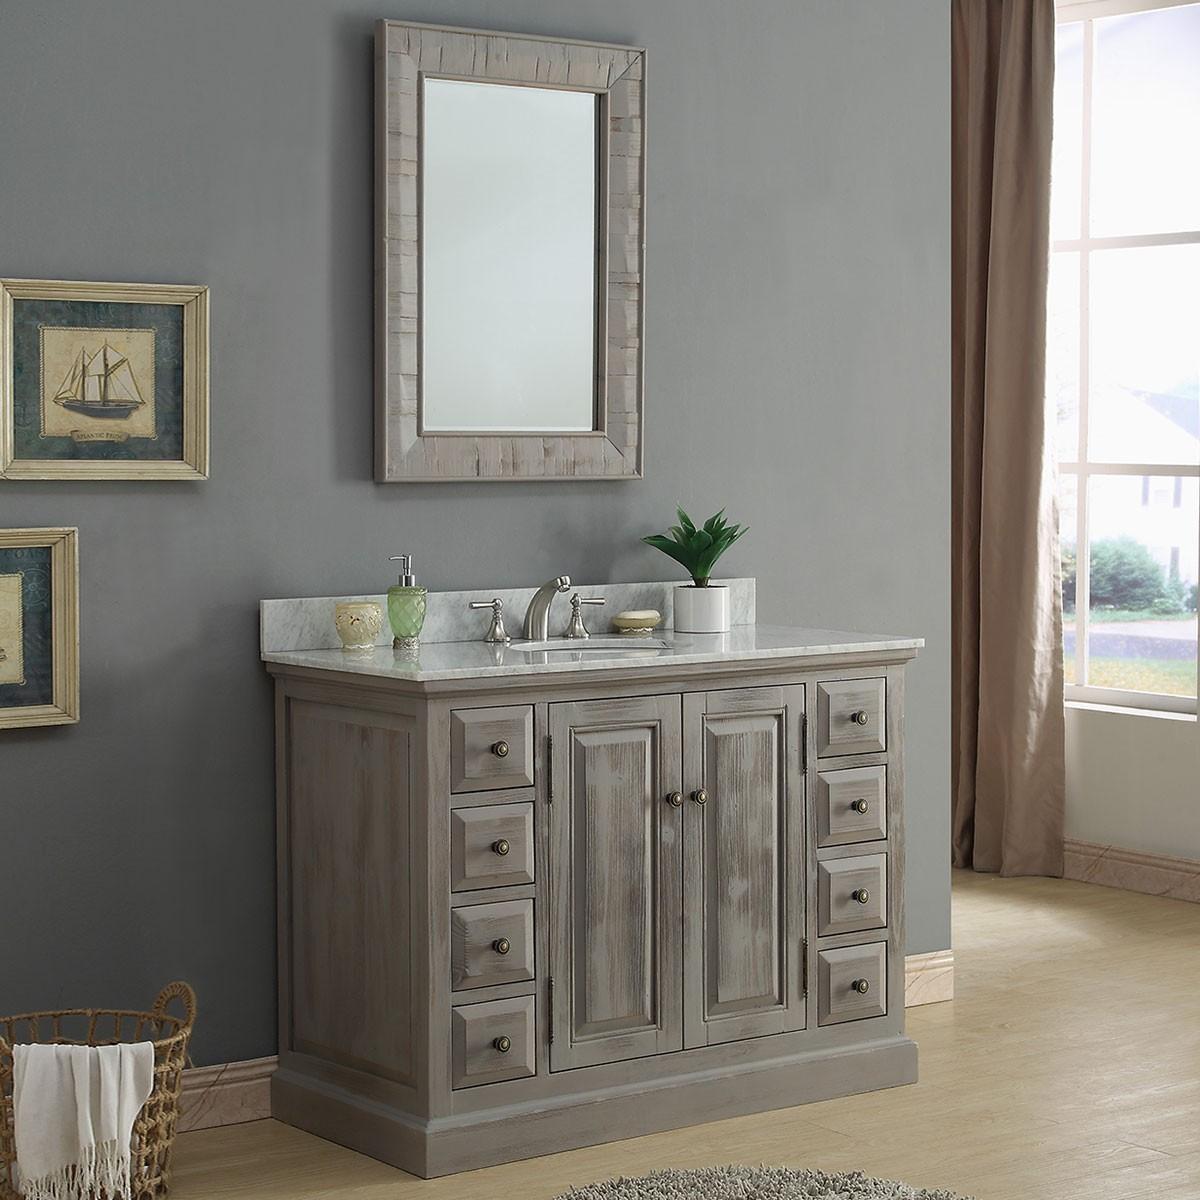 48 In. Freestanding Bathroom Vanity Set (DK-WK9448-SET)